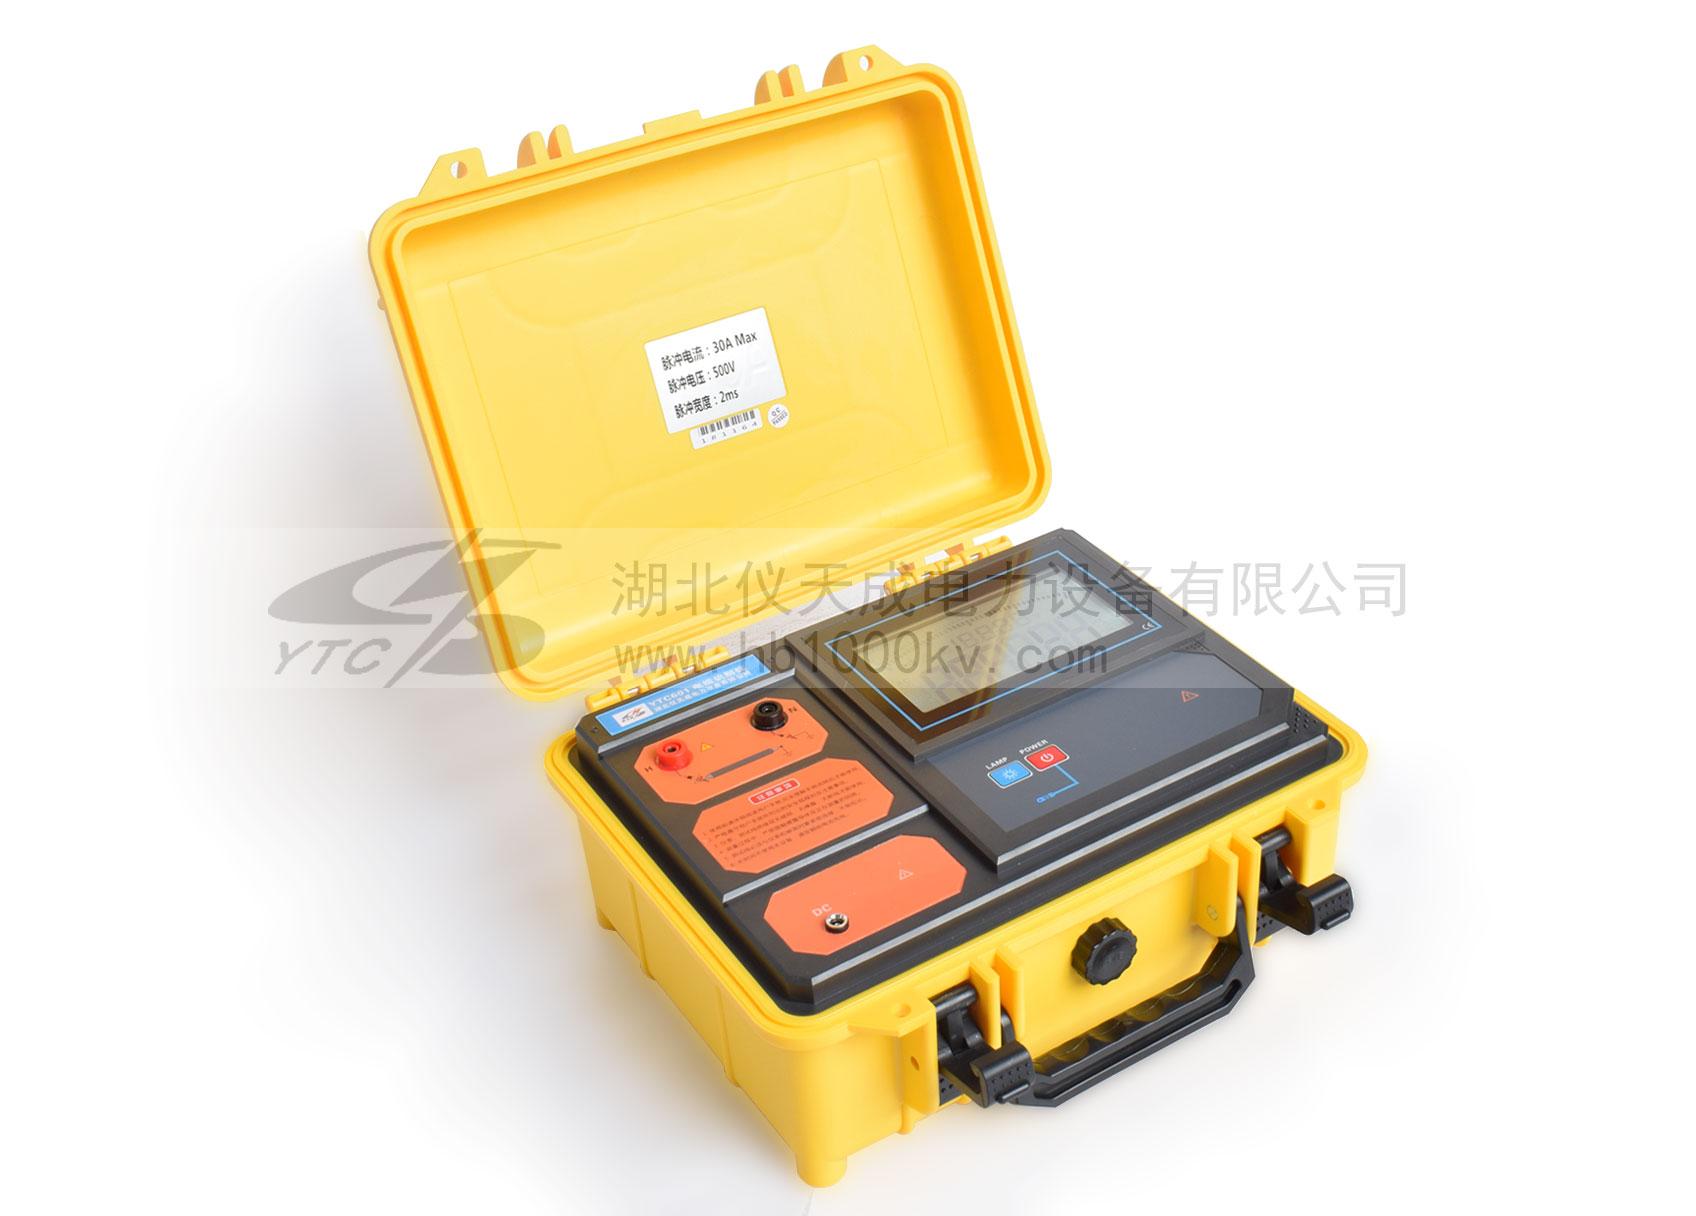 YTC601电缆识别仪